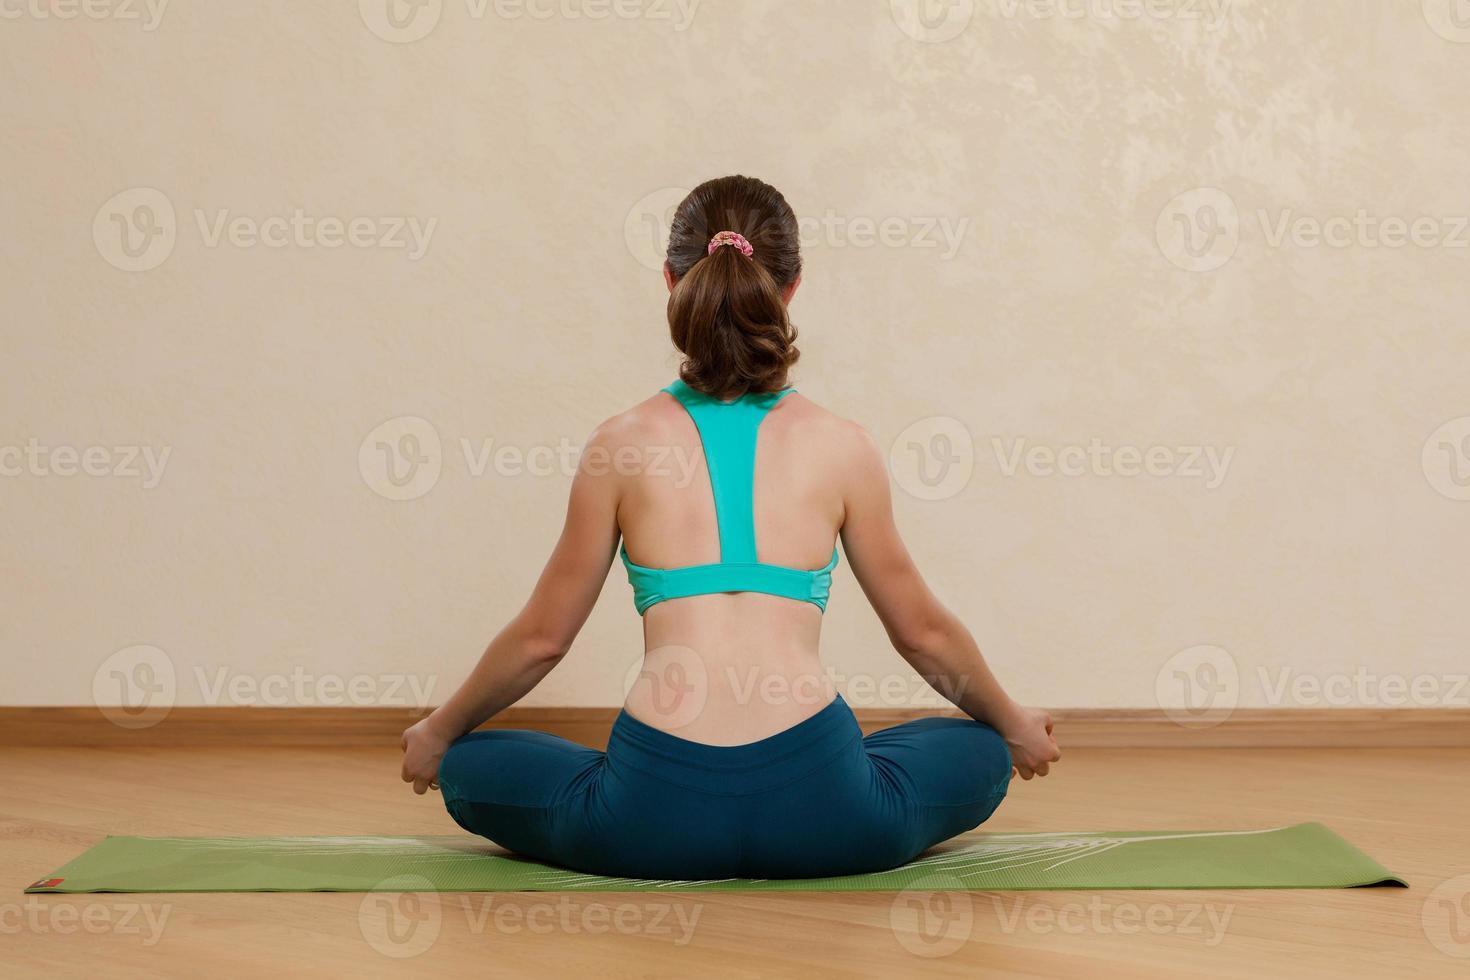 kaukasisk kvinna utövar yoga i studion (sukkhasana) foto